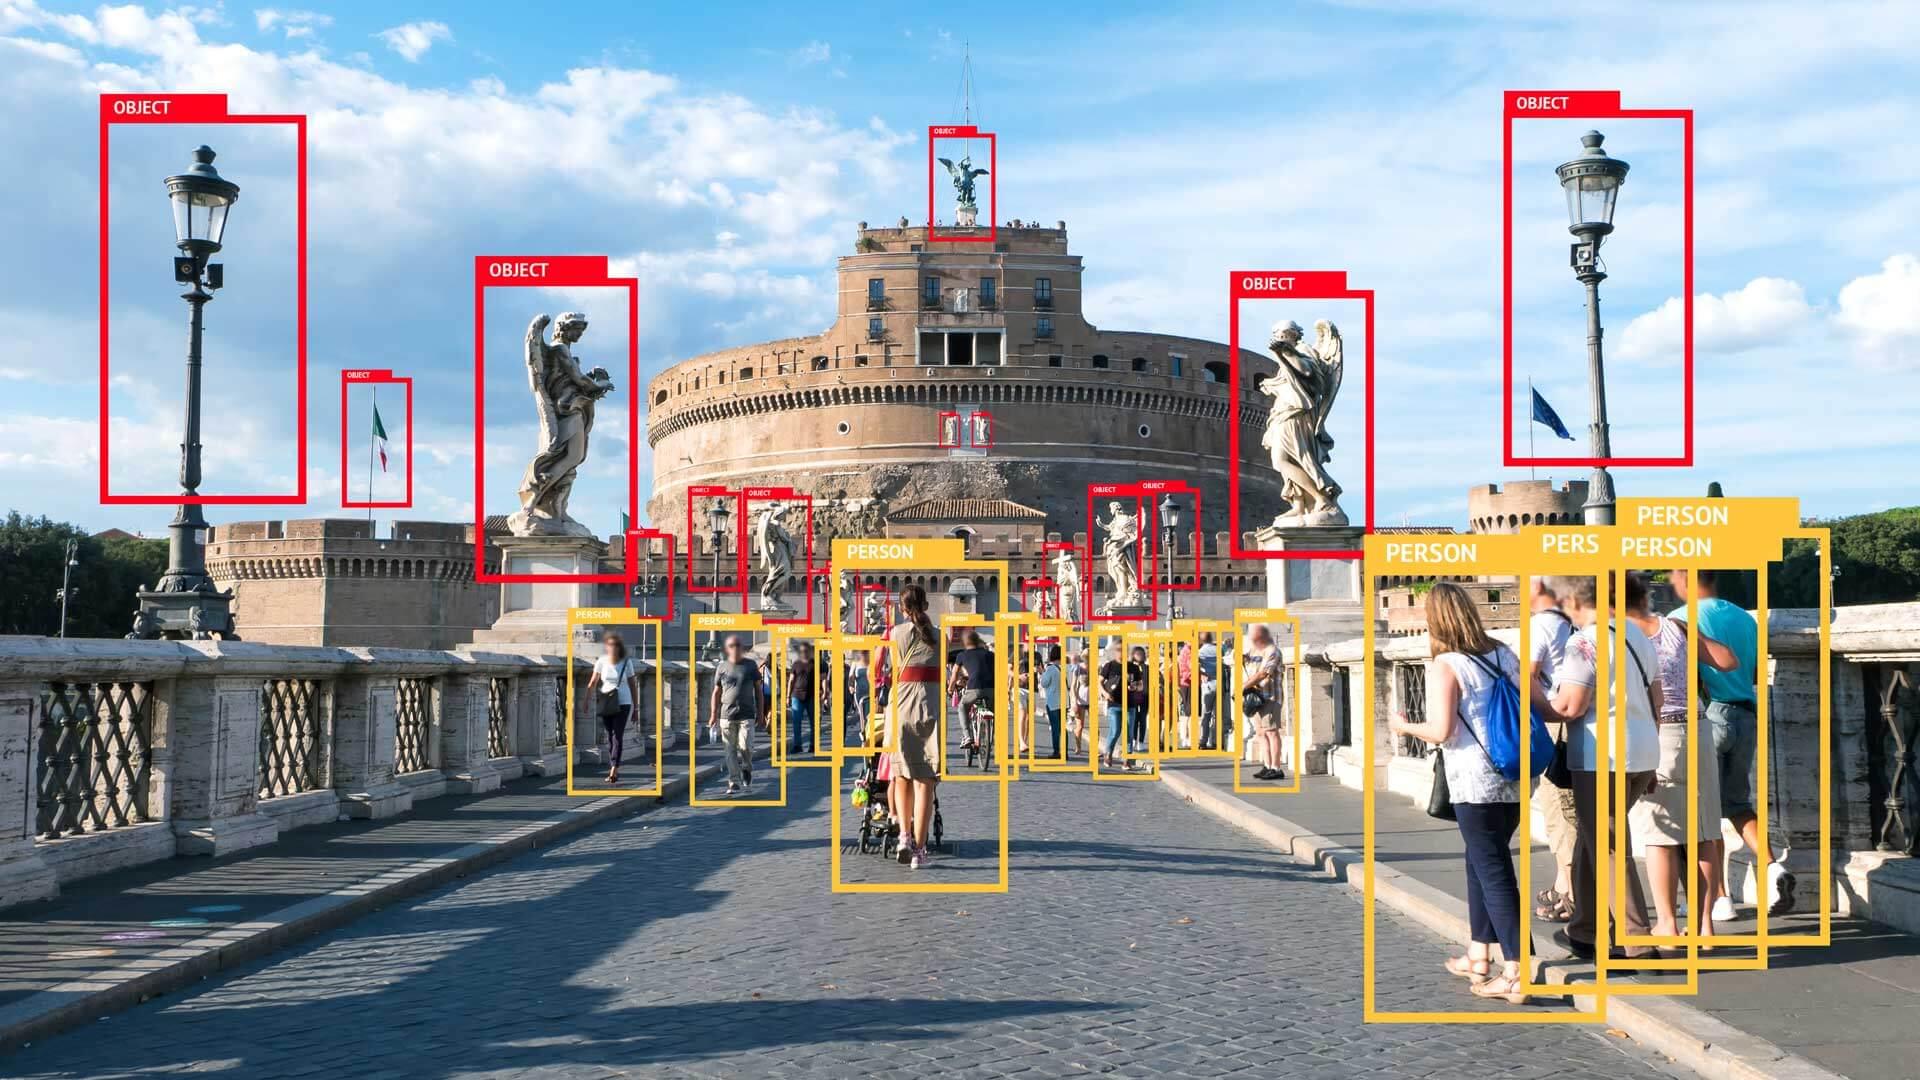 machine vision recognition